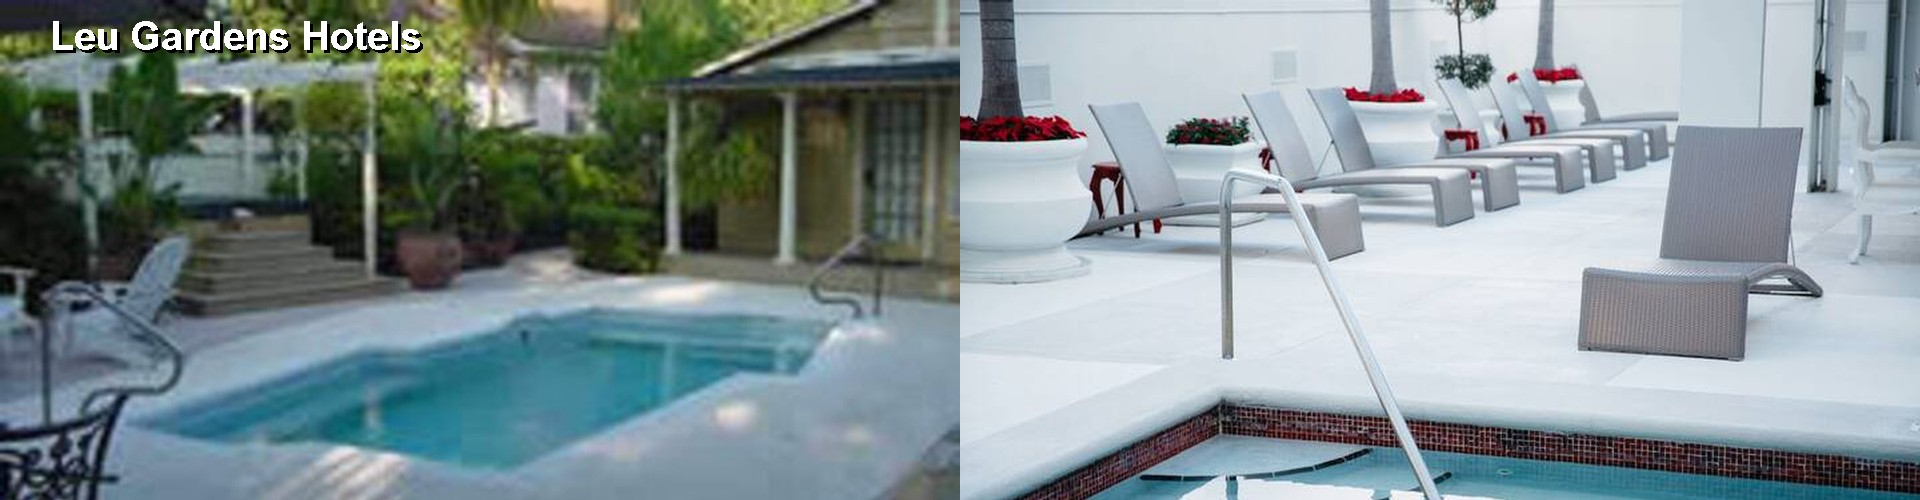 36 hotels near leu gardens in orlando fl